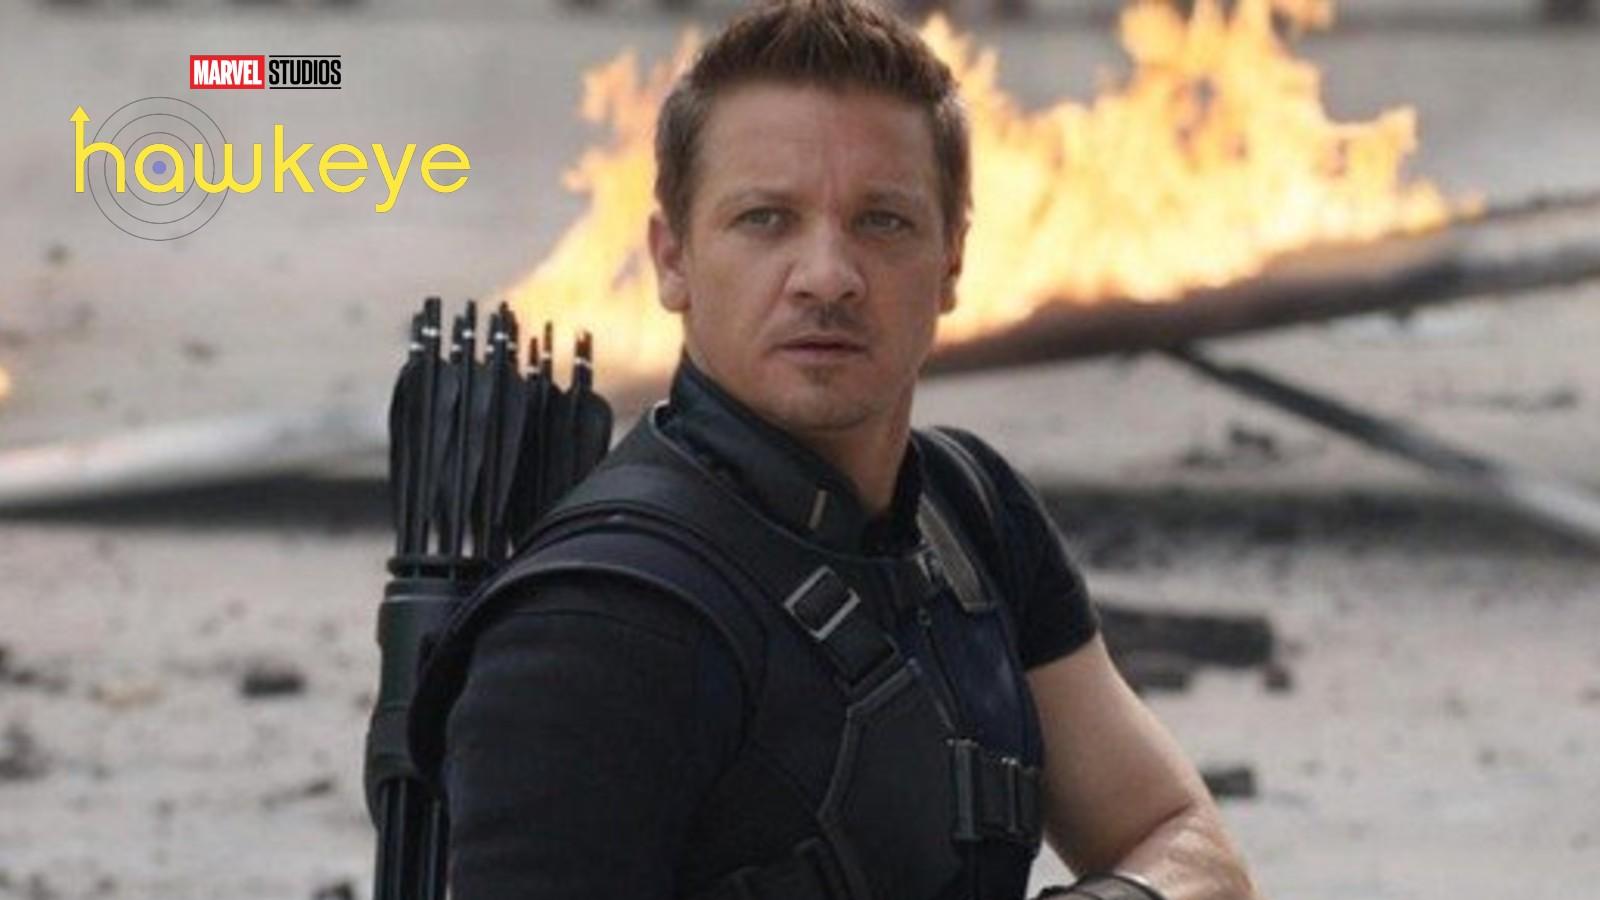 Hawkeye Clint Barton new Disney Plus series